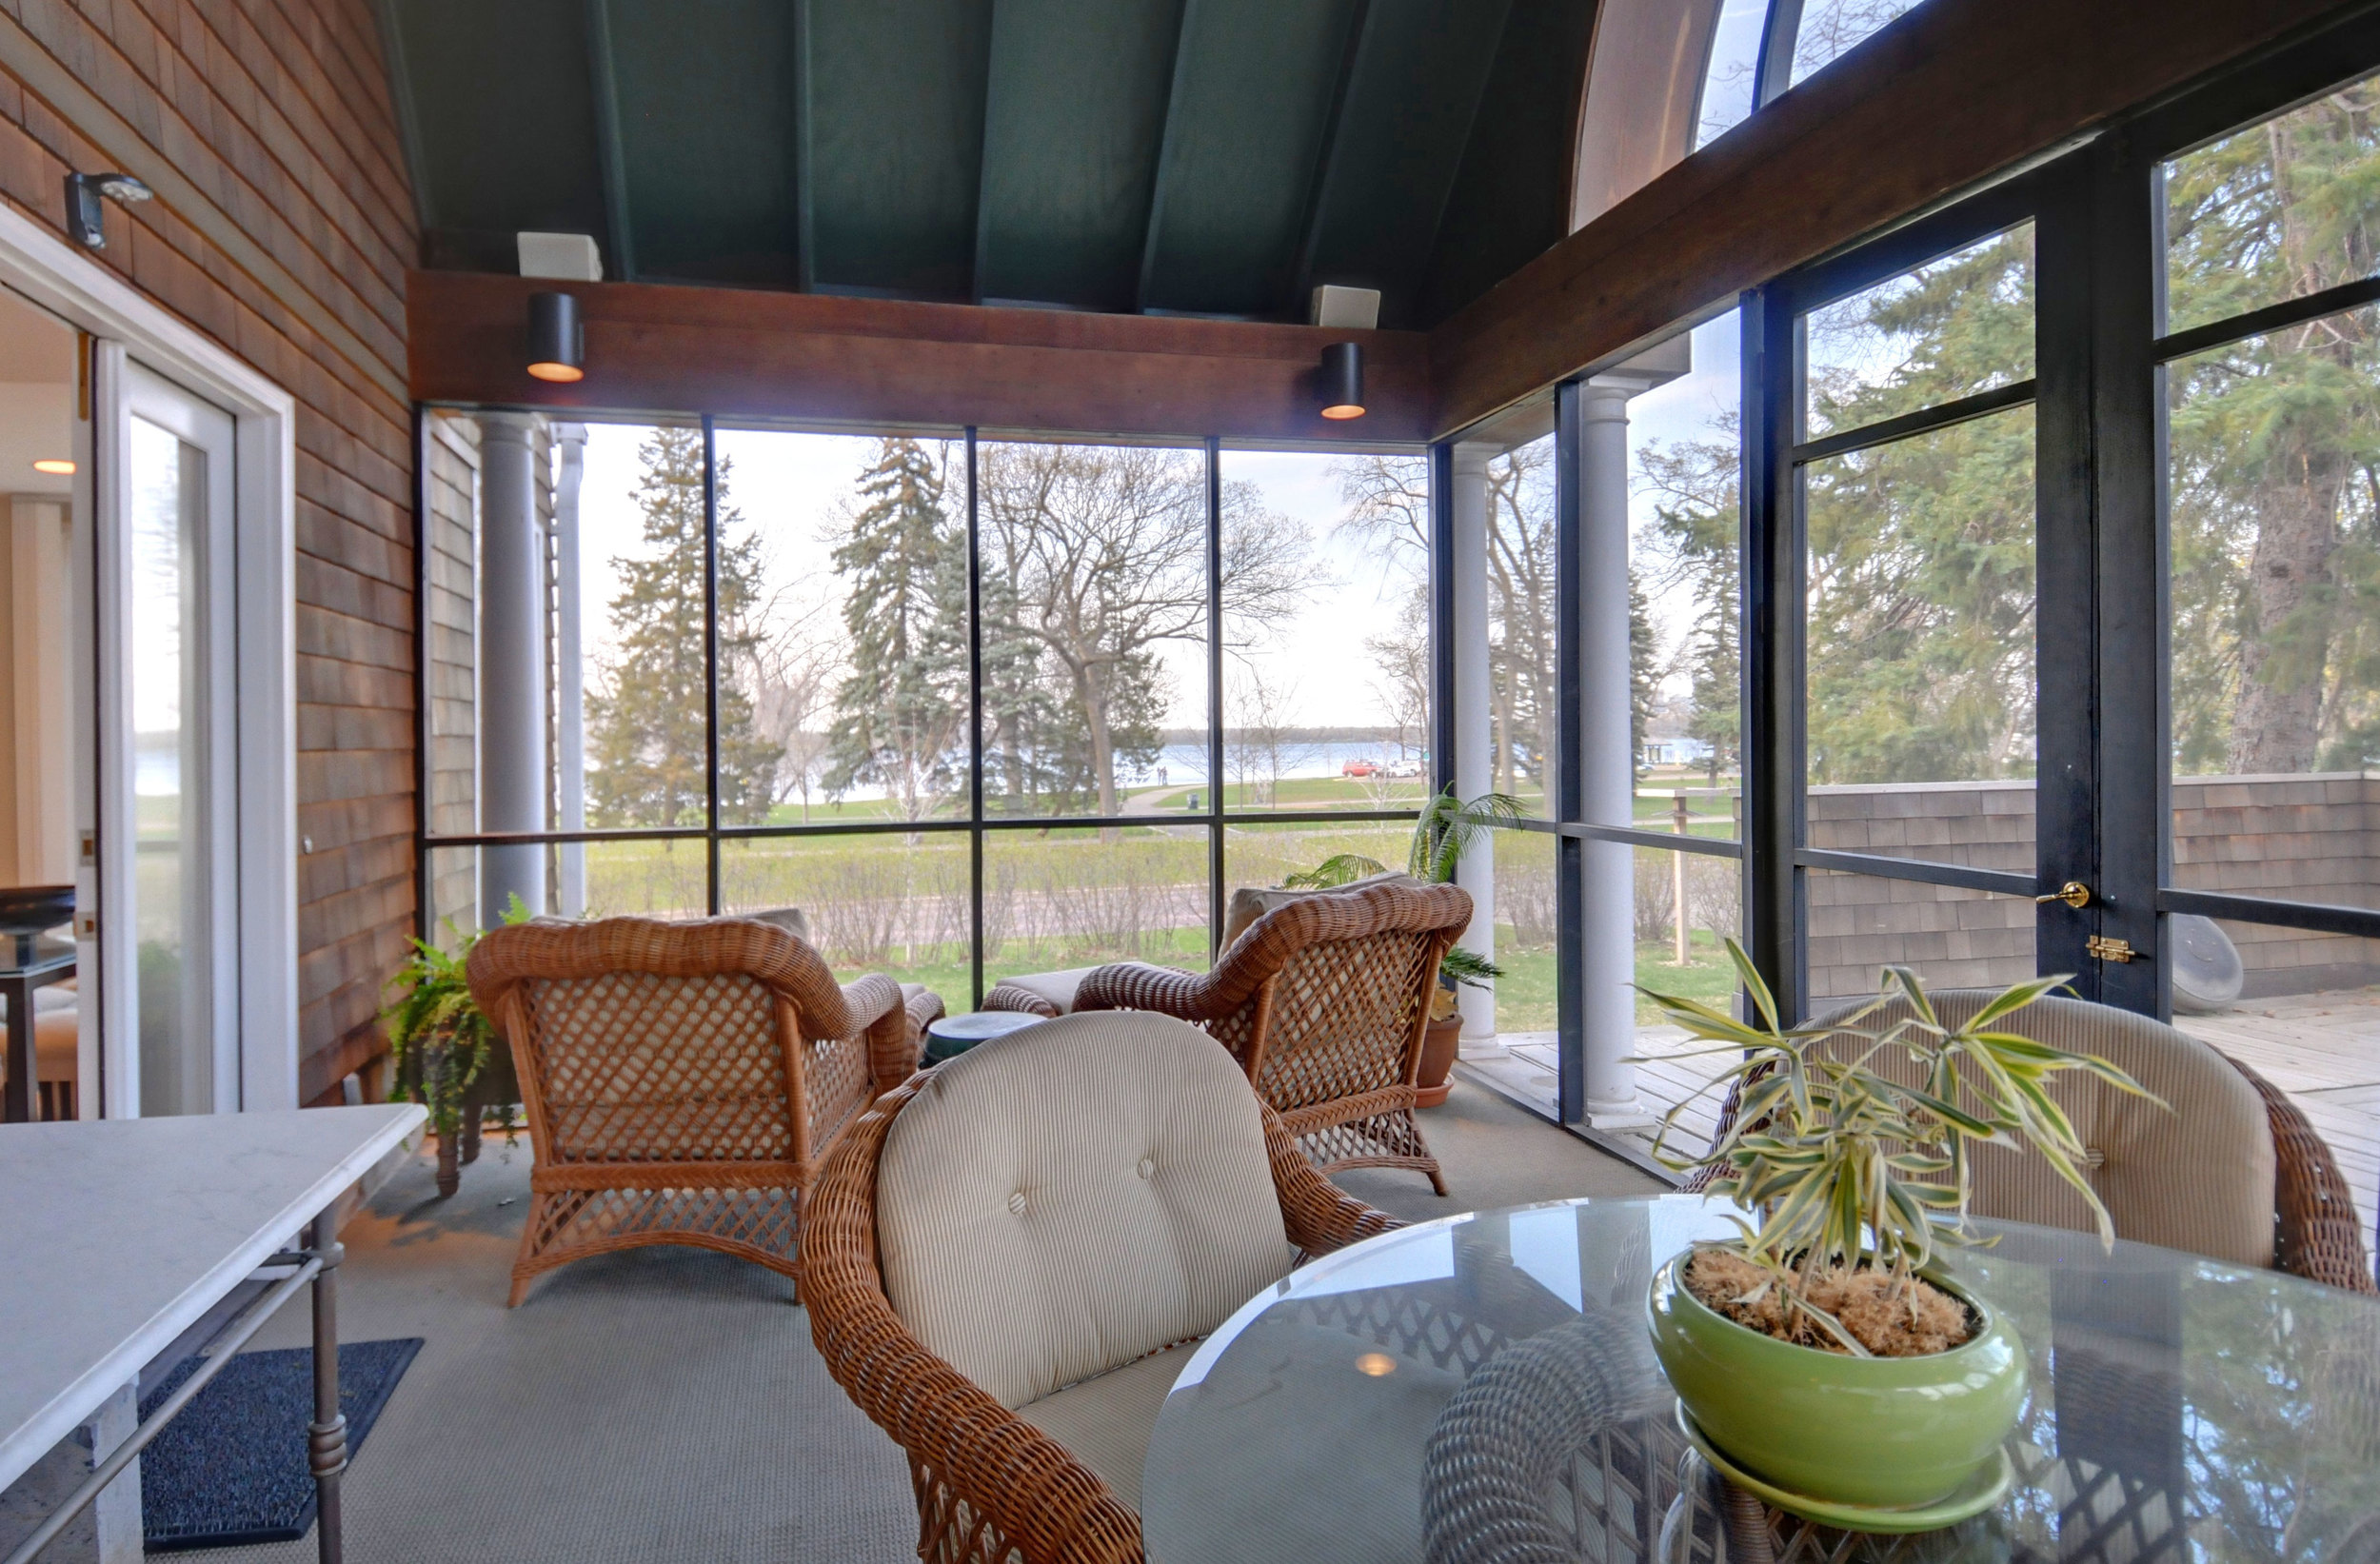 9.5 3738-porch-looking-to-calhoun.jpg